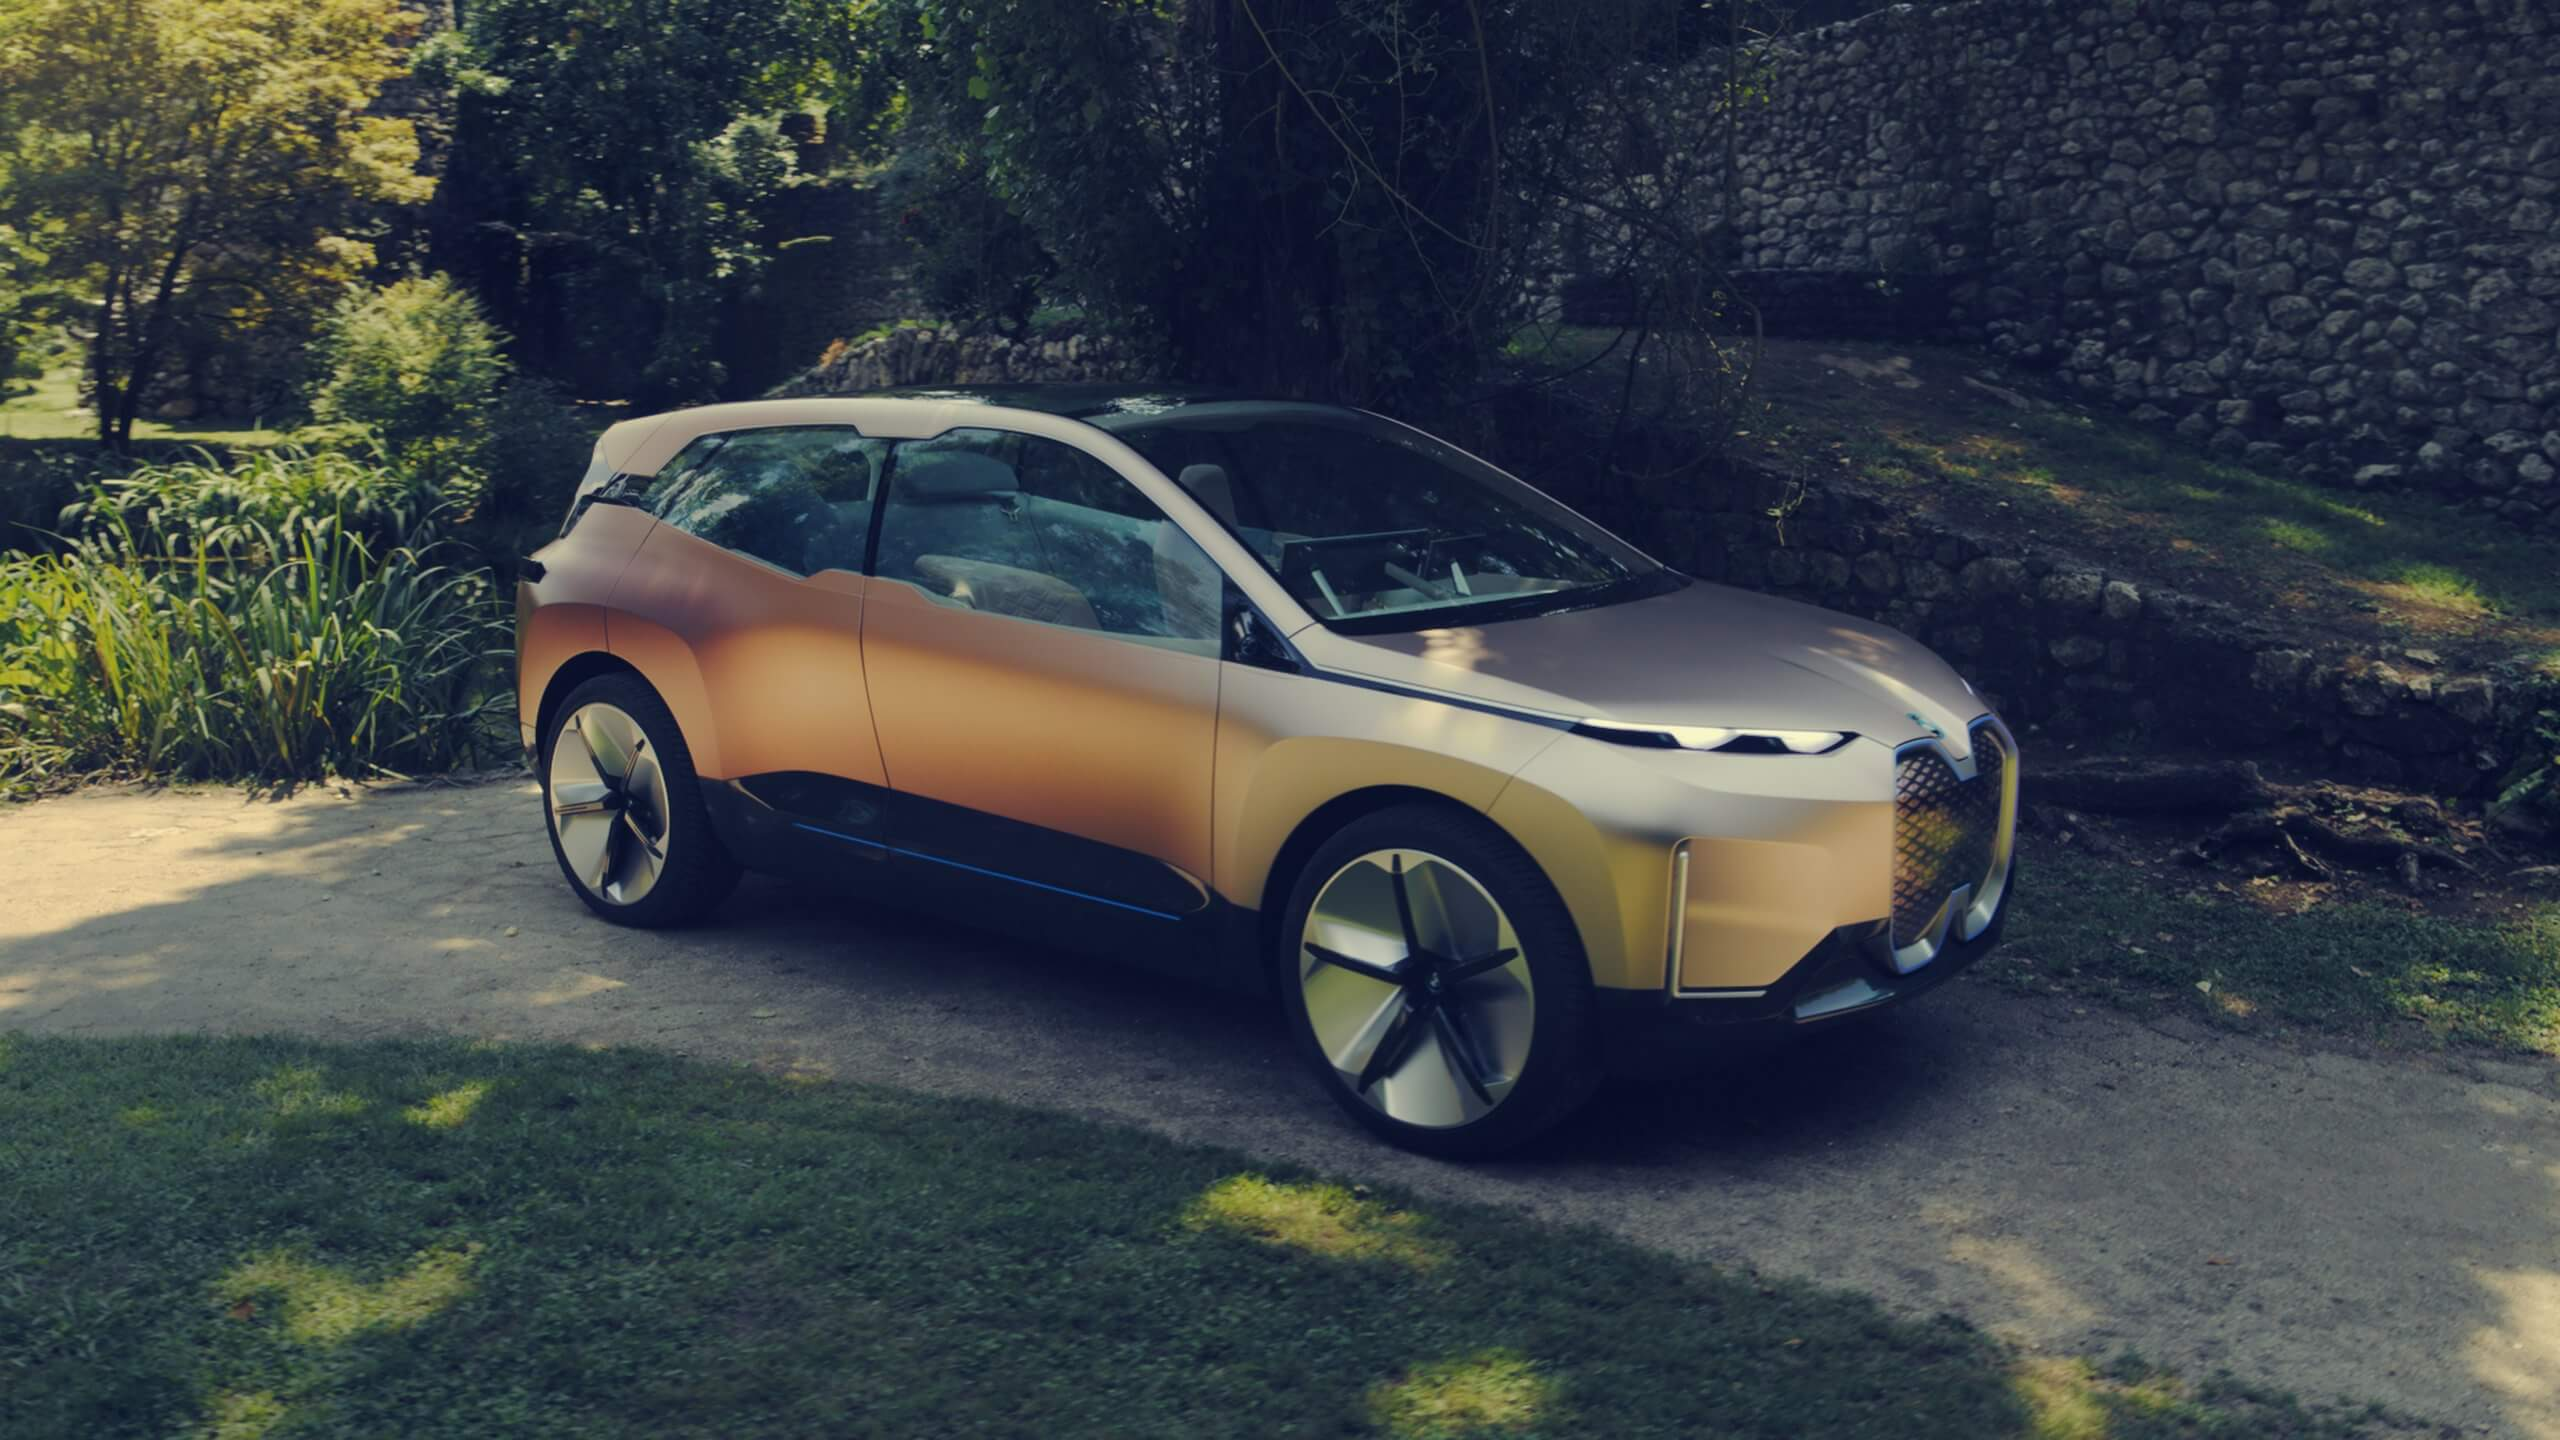 Pressebild des BMW iNext / Image by BMW